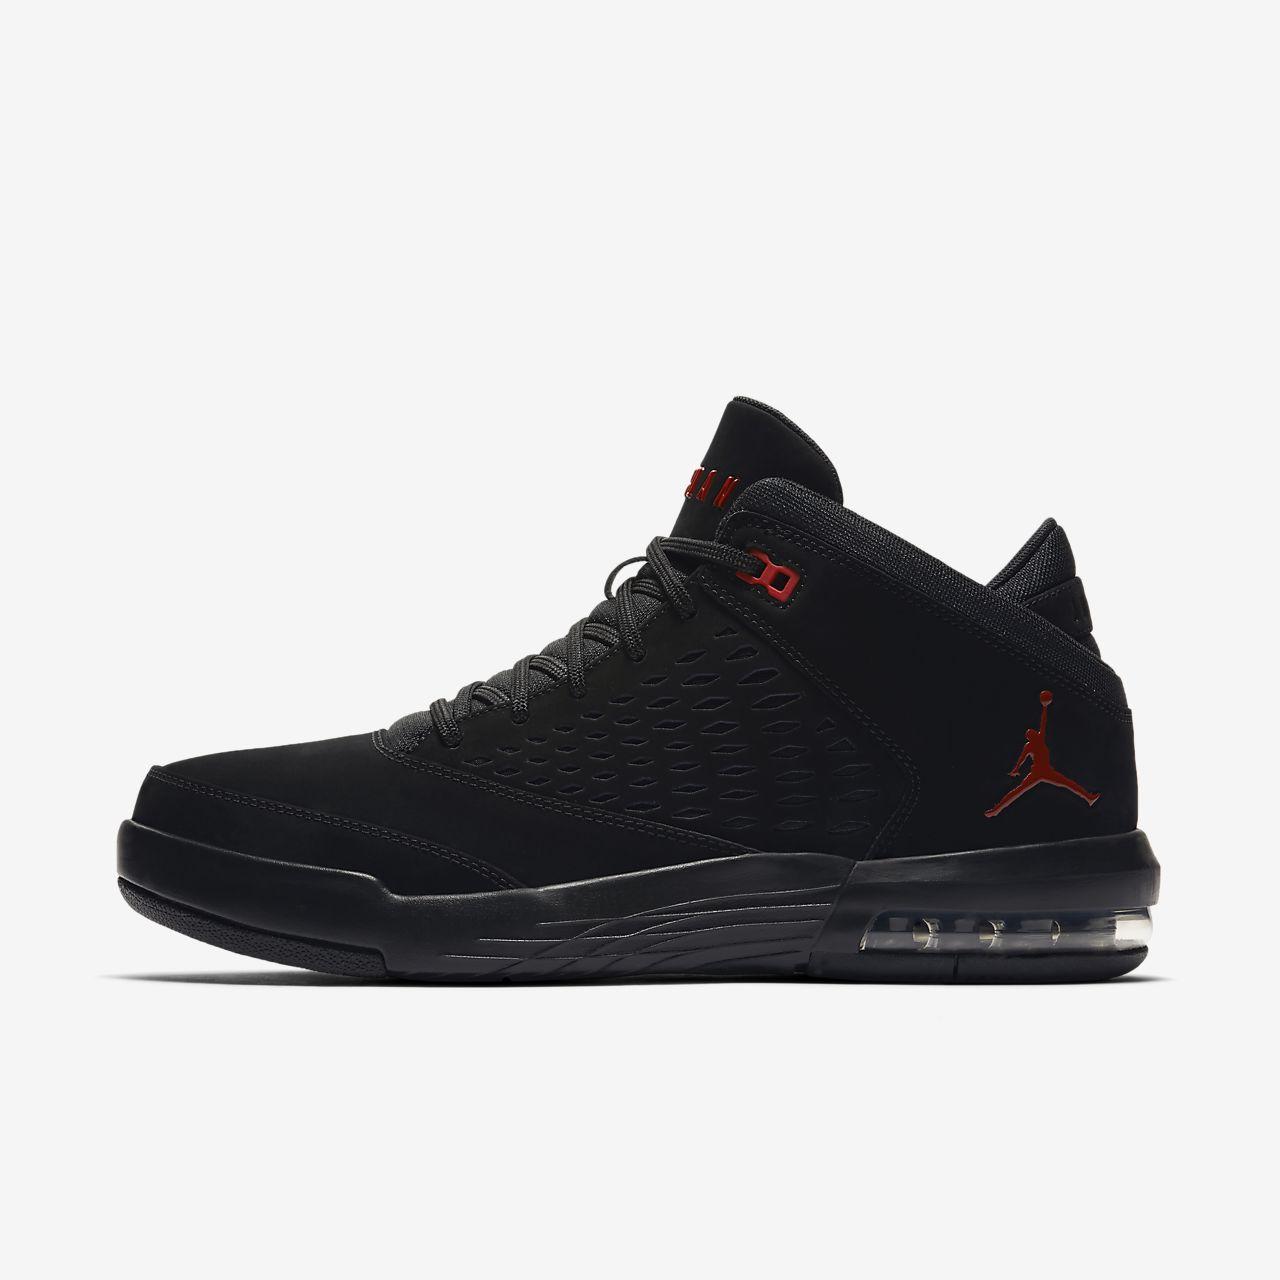 4166a5fe83f Calzado para hombre Jordan Flight Origin 4. Nike.com MX